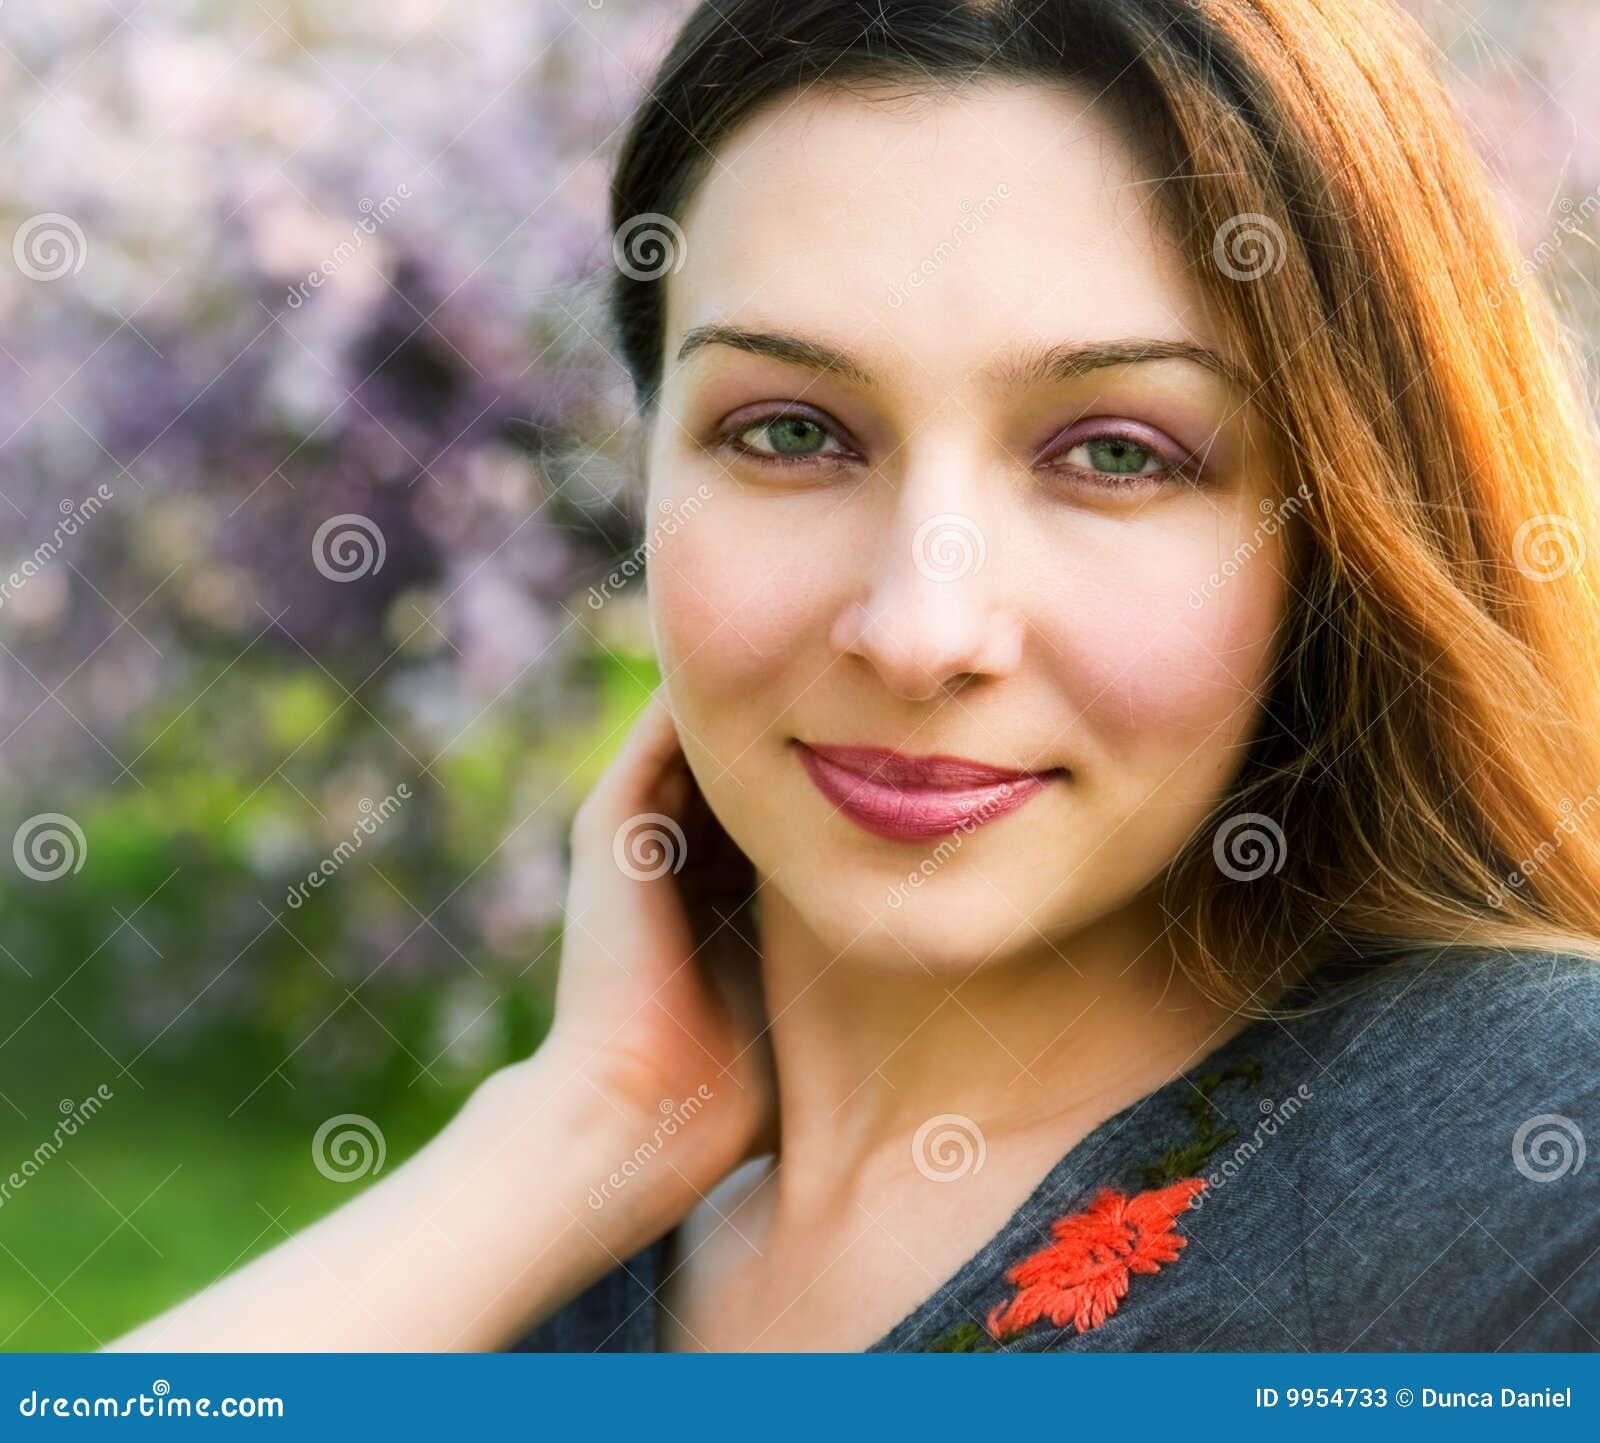 sorriso-da-mulher-bonita-sereno-sensual-ao-ar-livre-9954733.jpg